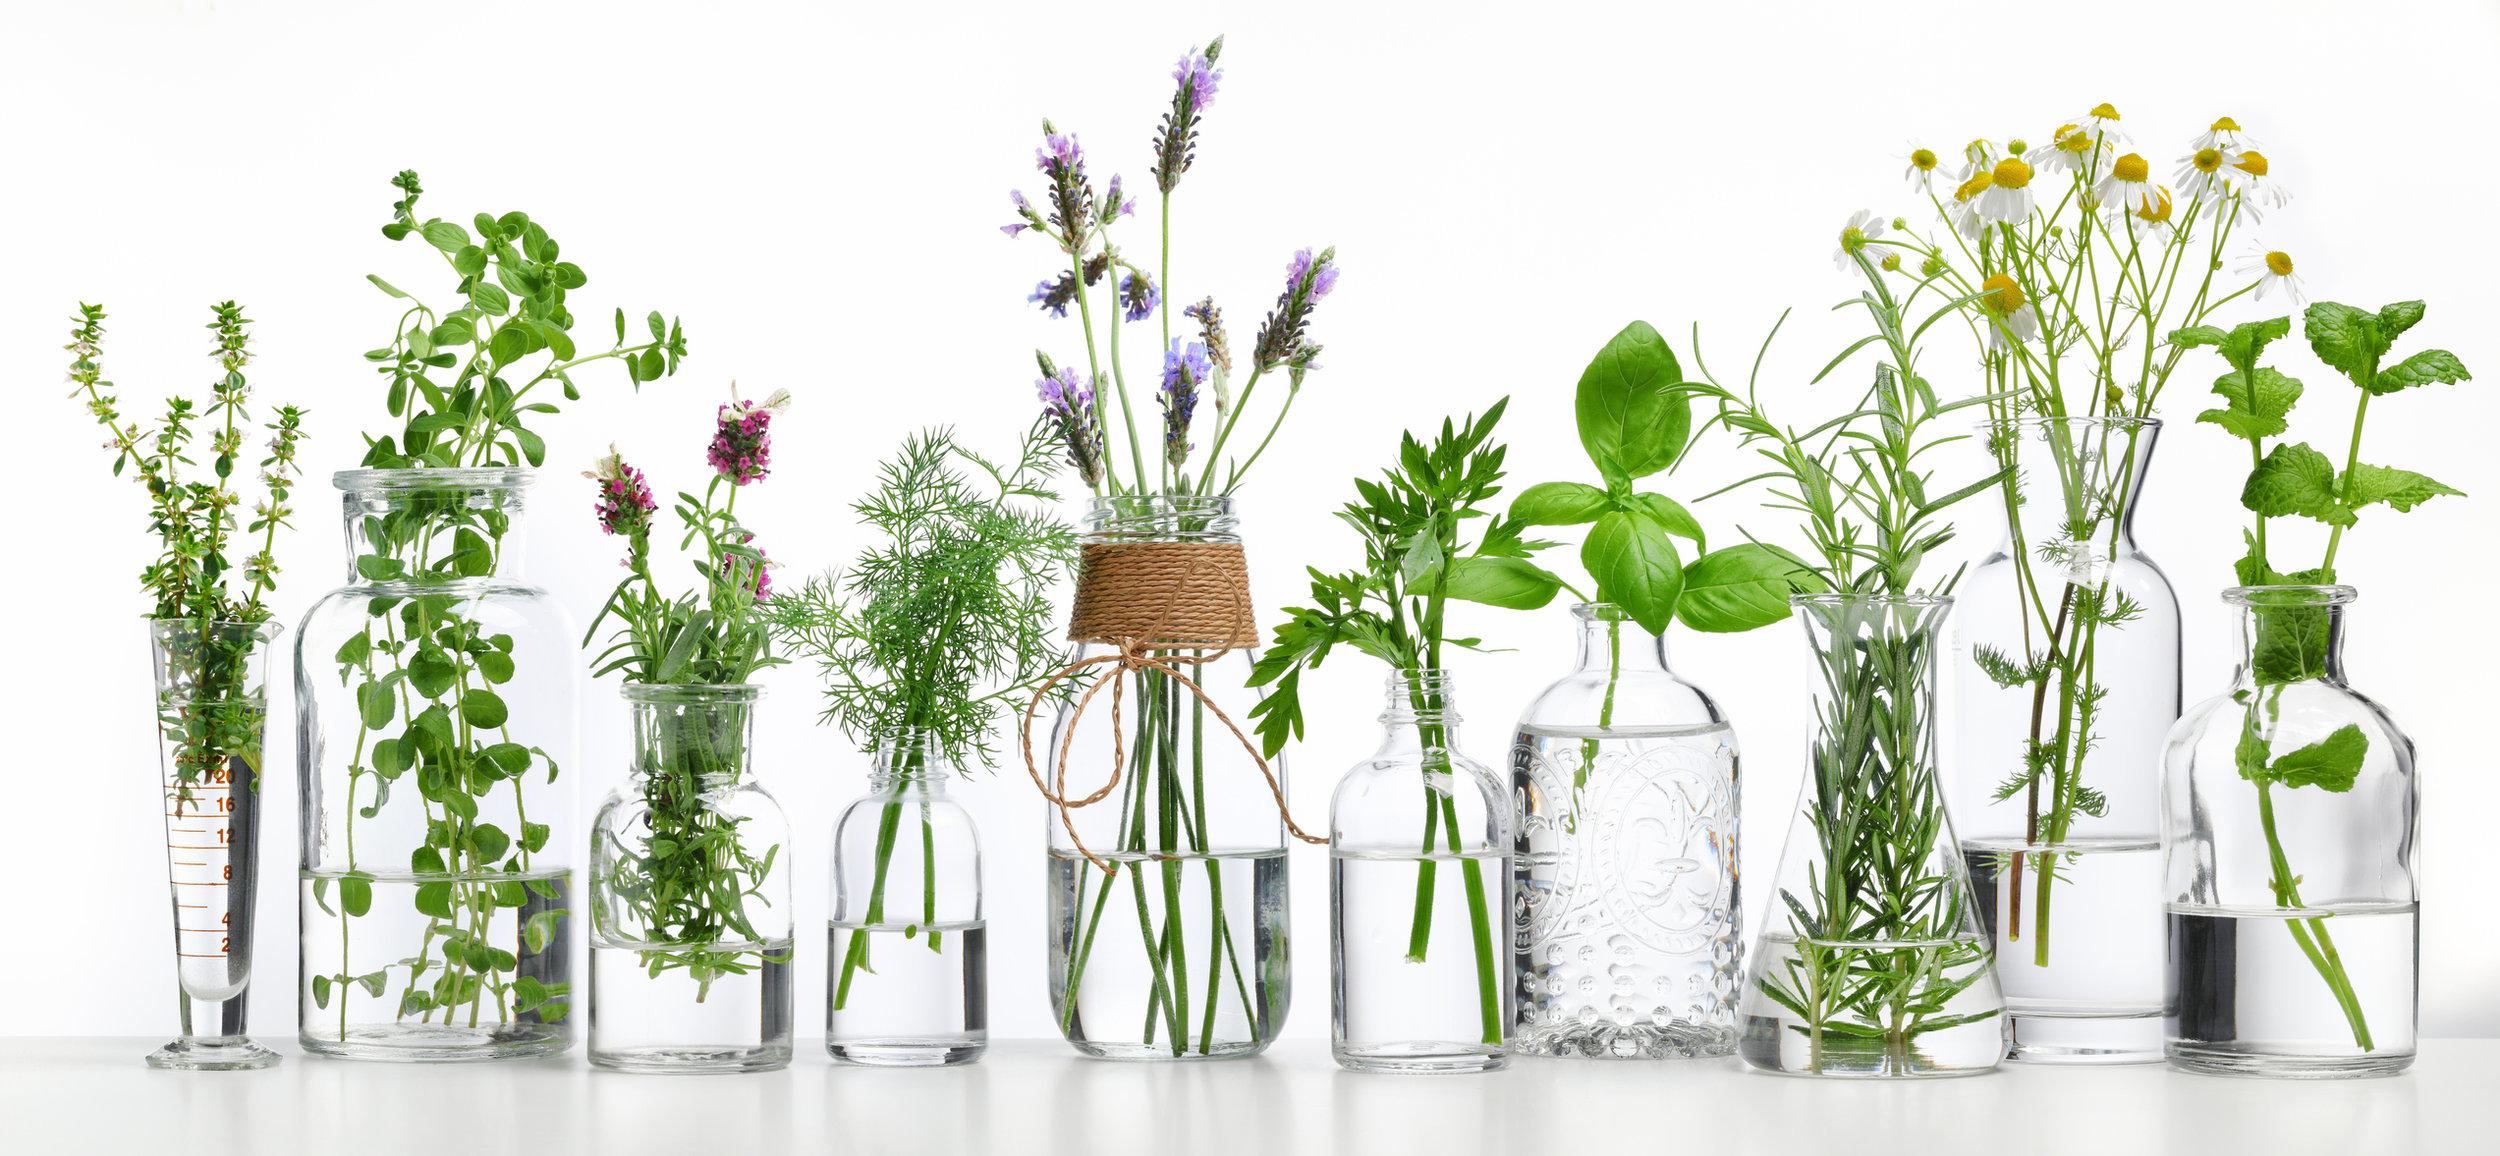 Growing Herbs Indoors B B Barns Garden Center Landscape Services